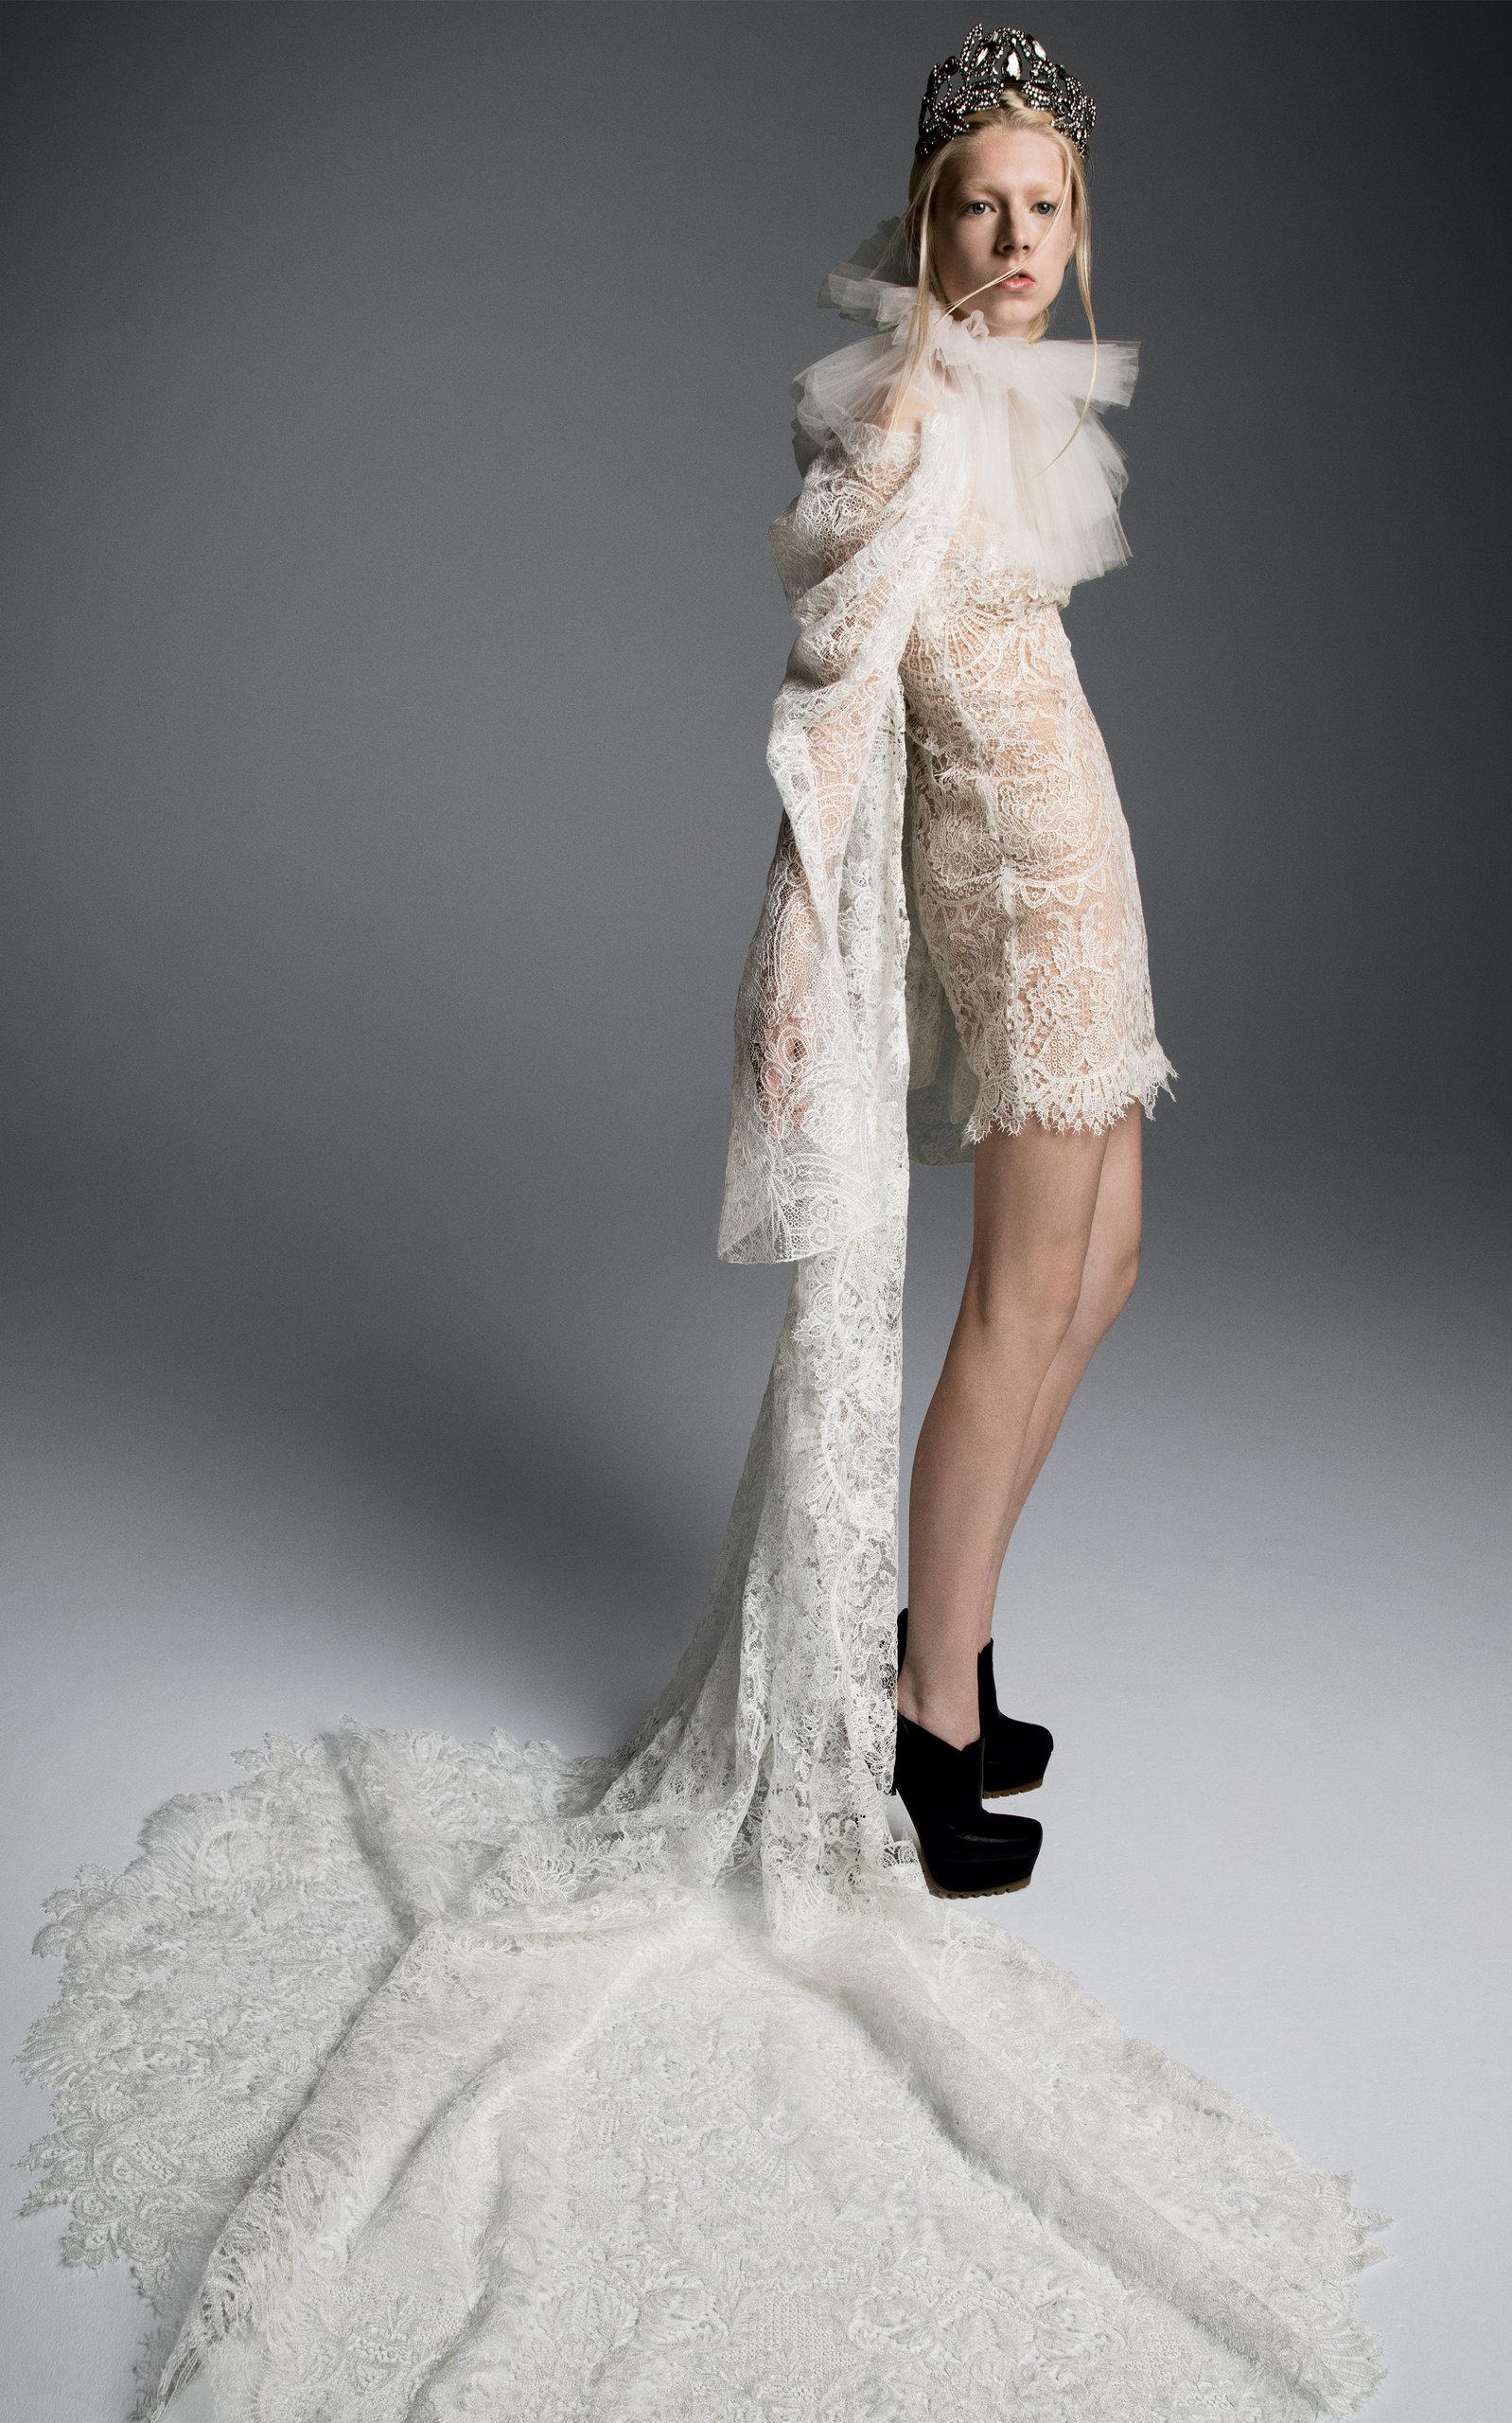 b766f4a39690 Maria M Macrame Short Dress With Dramatic Draped Sleeve by Vera Wang ...